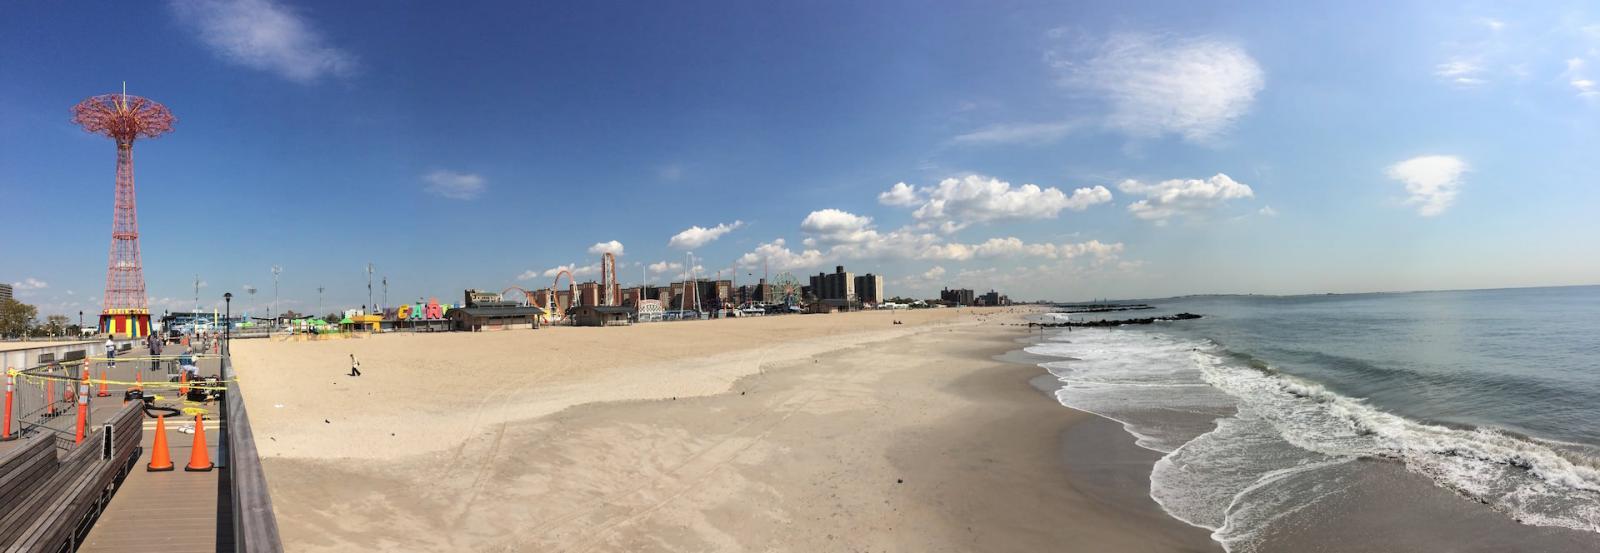 Coney Island vom Meer aus